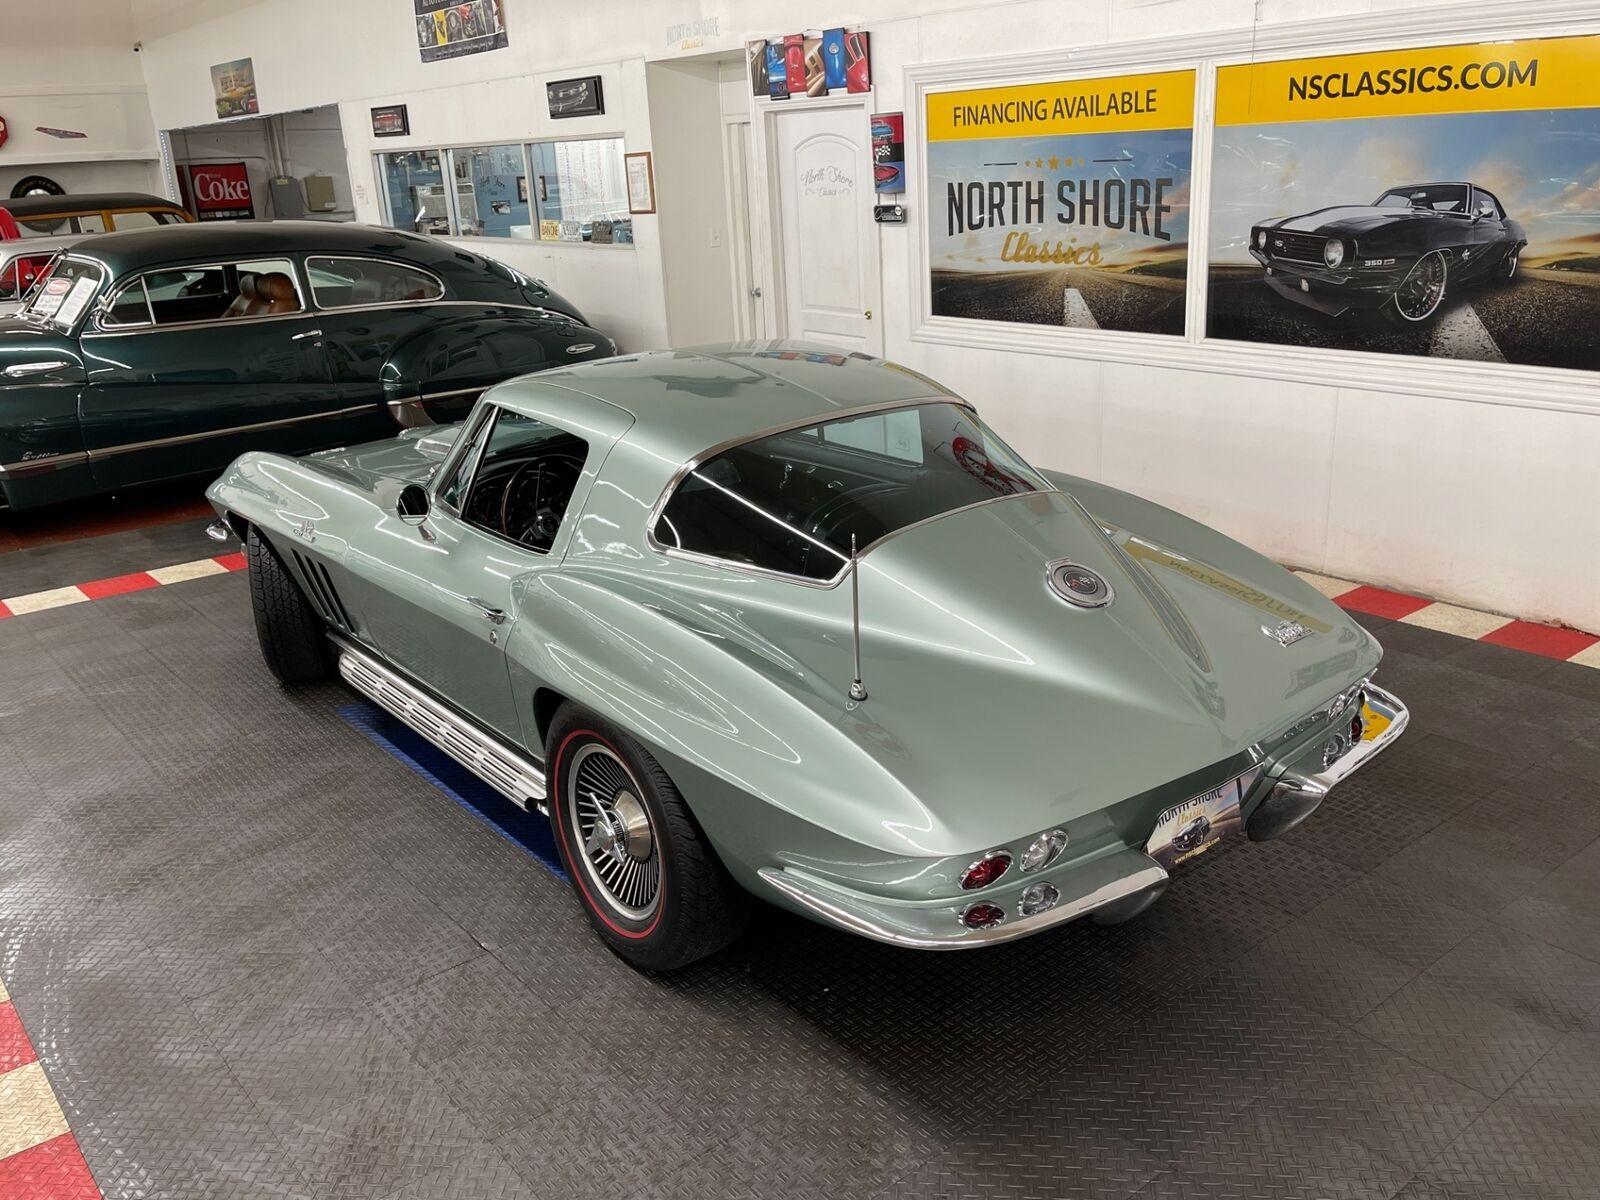 1966 Green Chevrolet Corvette Coupe  | C2 Corvette Photo 3